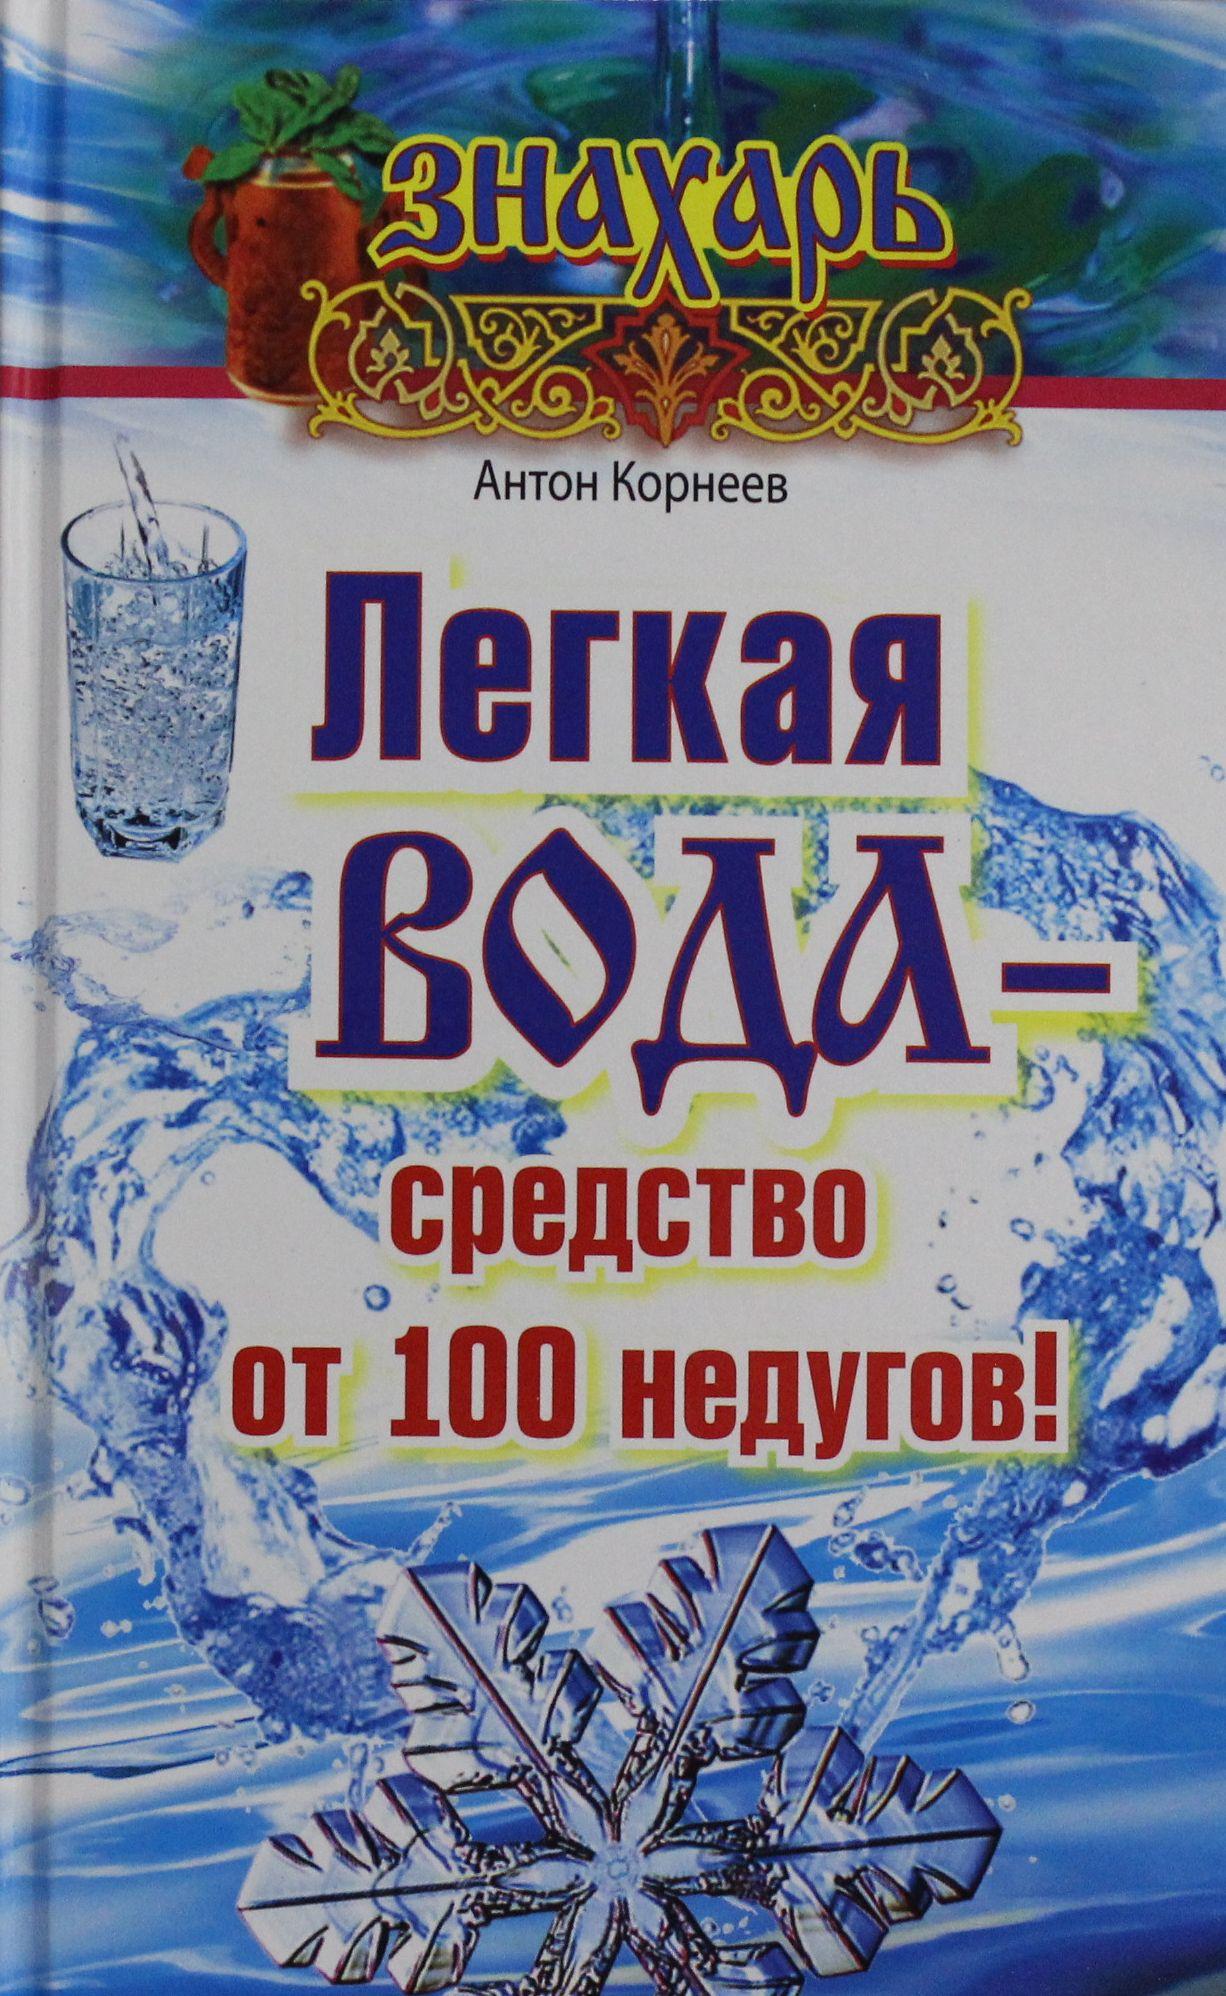 Legkaja voda - sredstvo ot 100 nedugov!